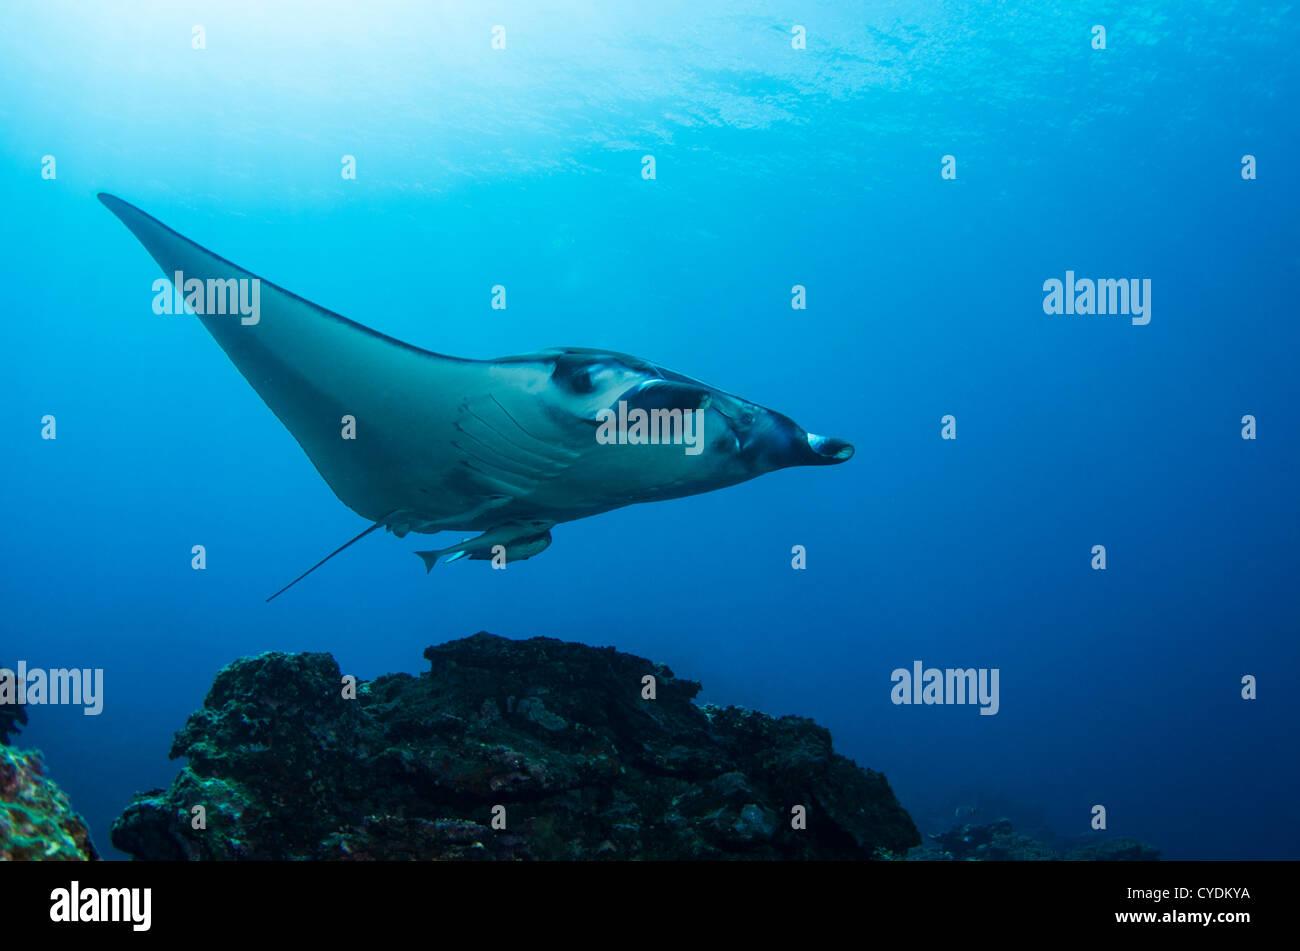 manta ray at 'manta scramble' Kabira Bay off the coast of Ishigaki Island, Okinawa, Japan. - Stock Image